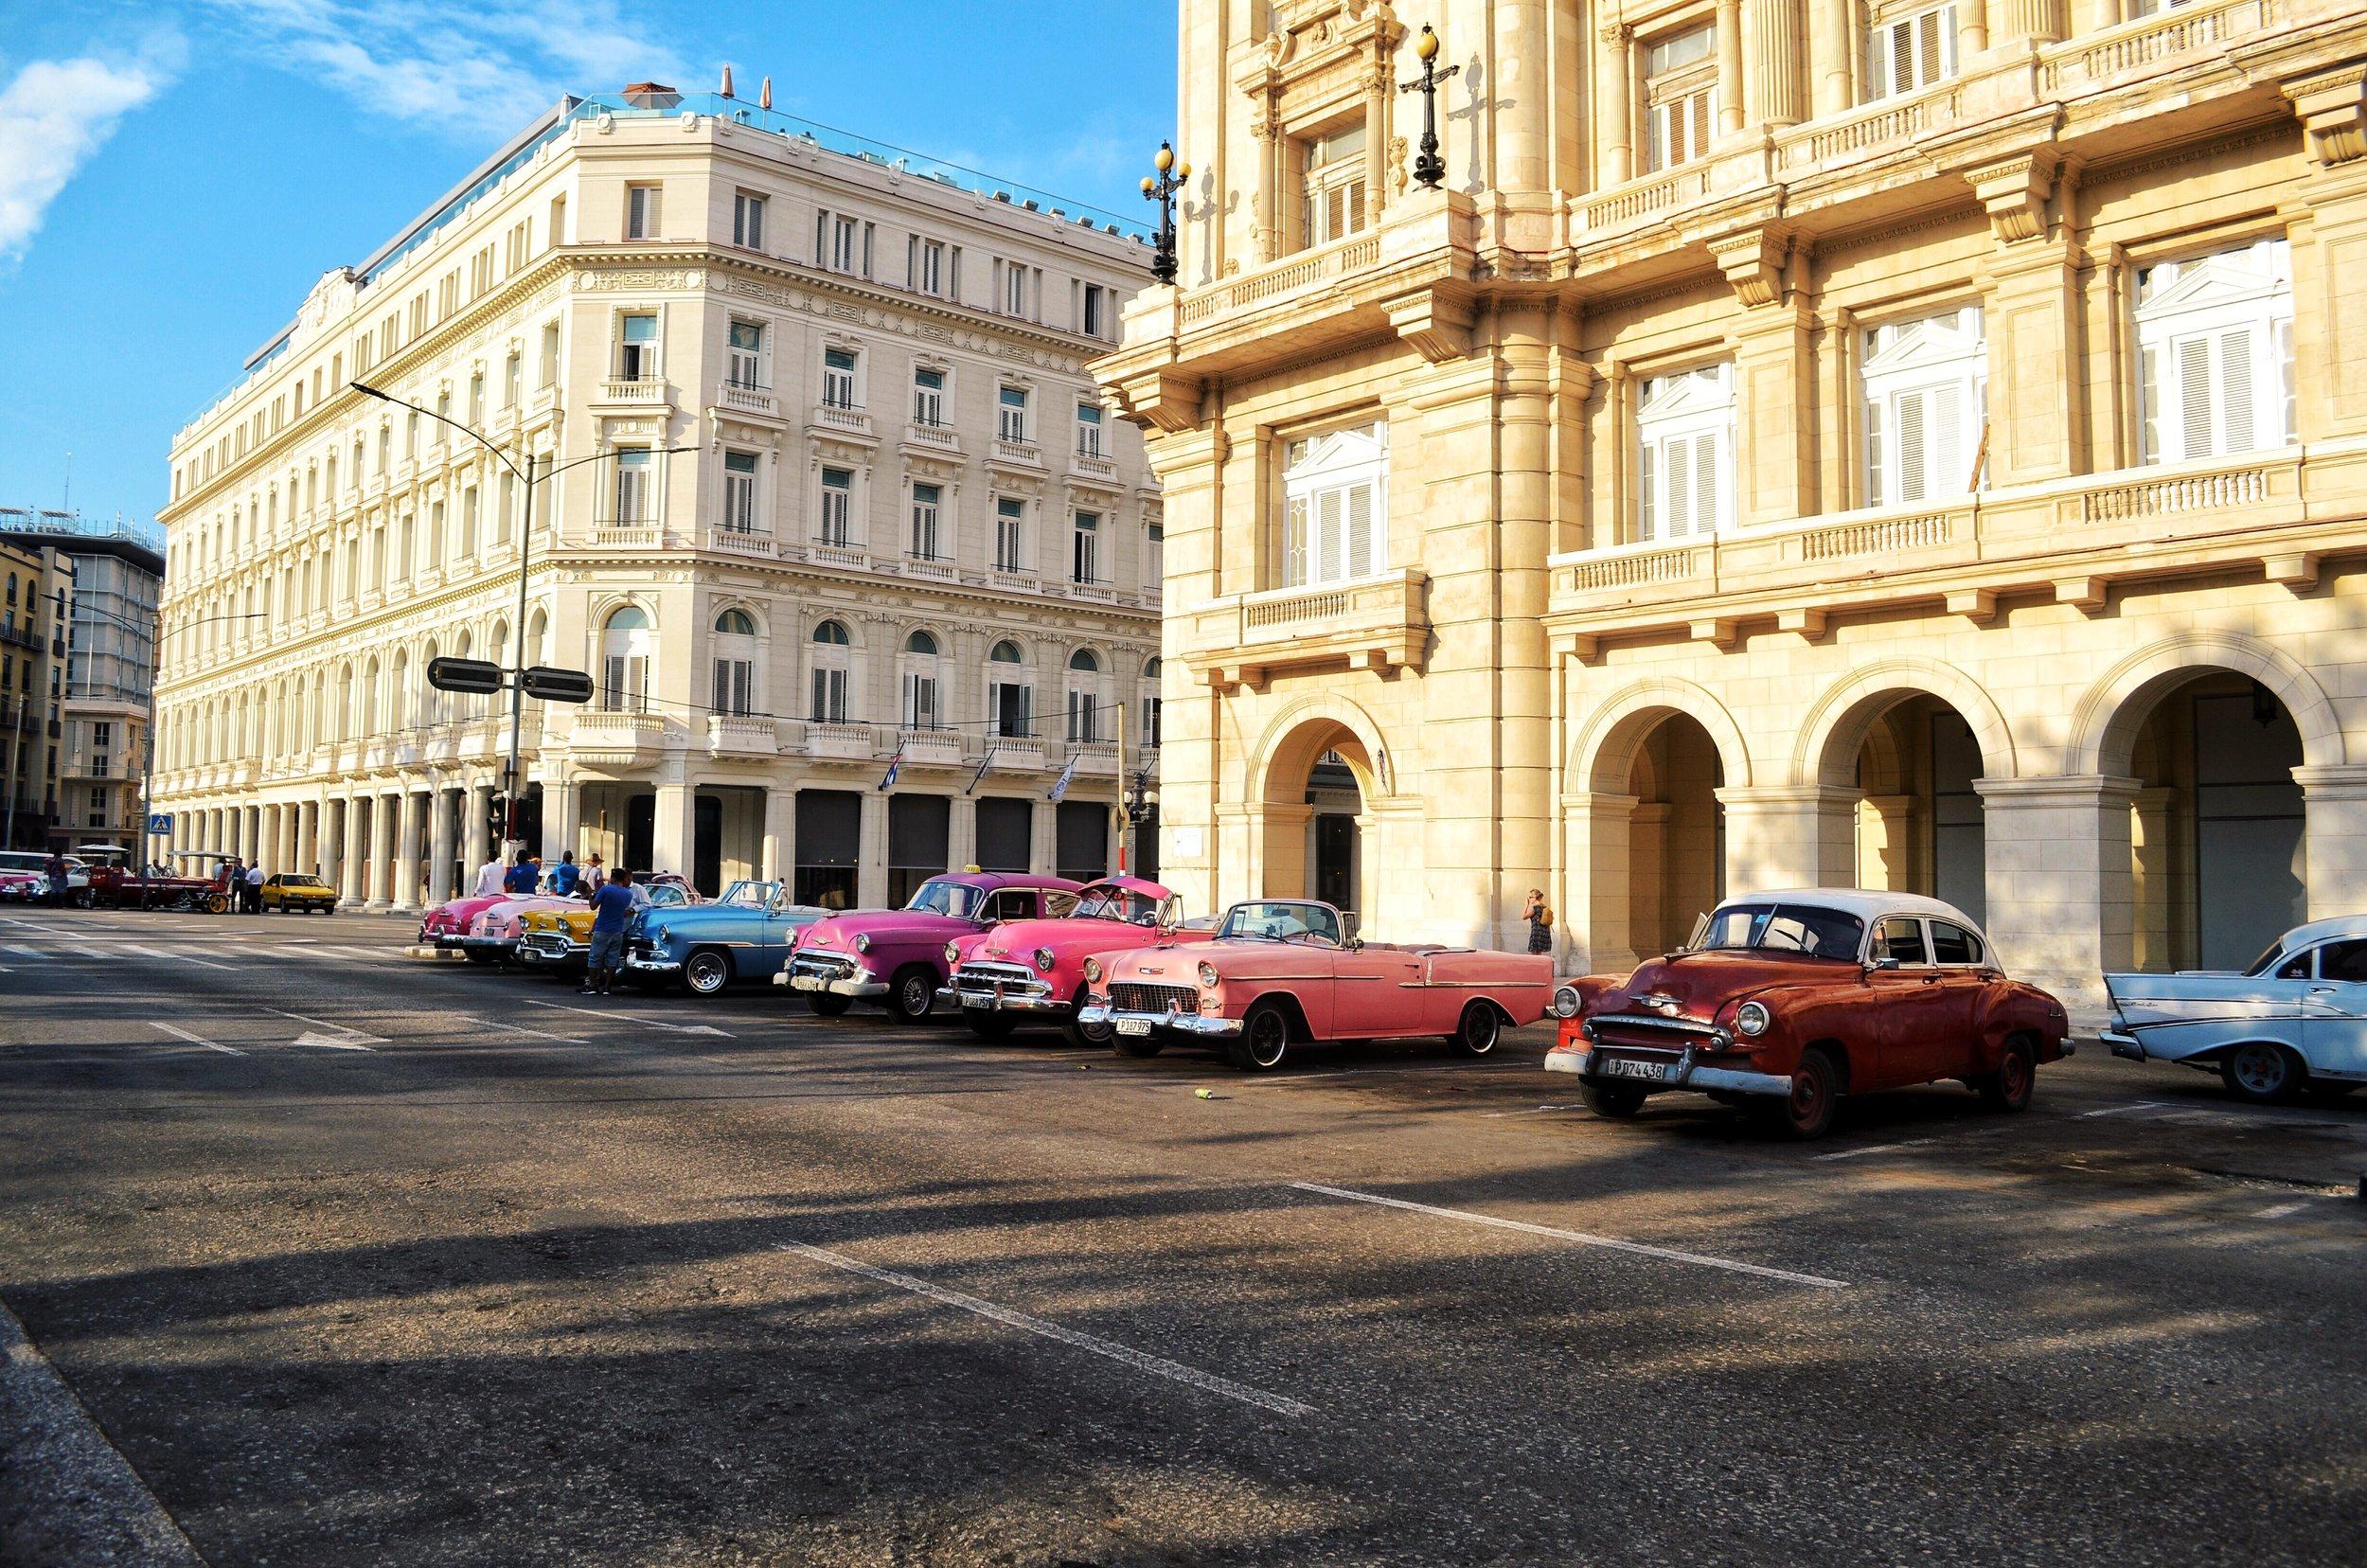 Vintage cars in Old Havana, Cuba